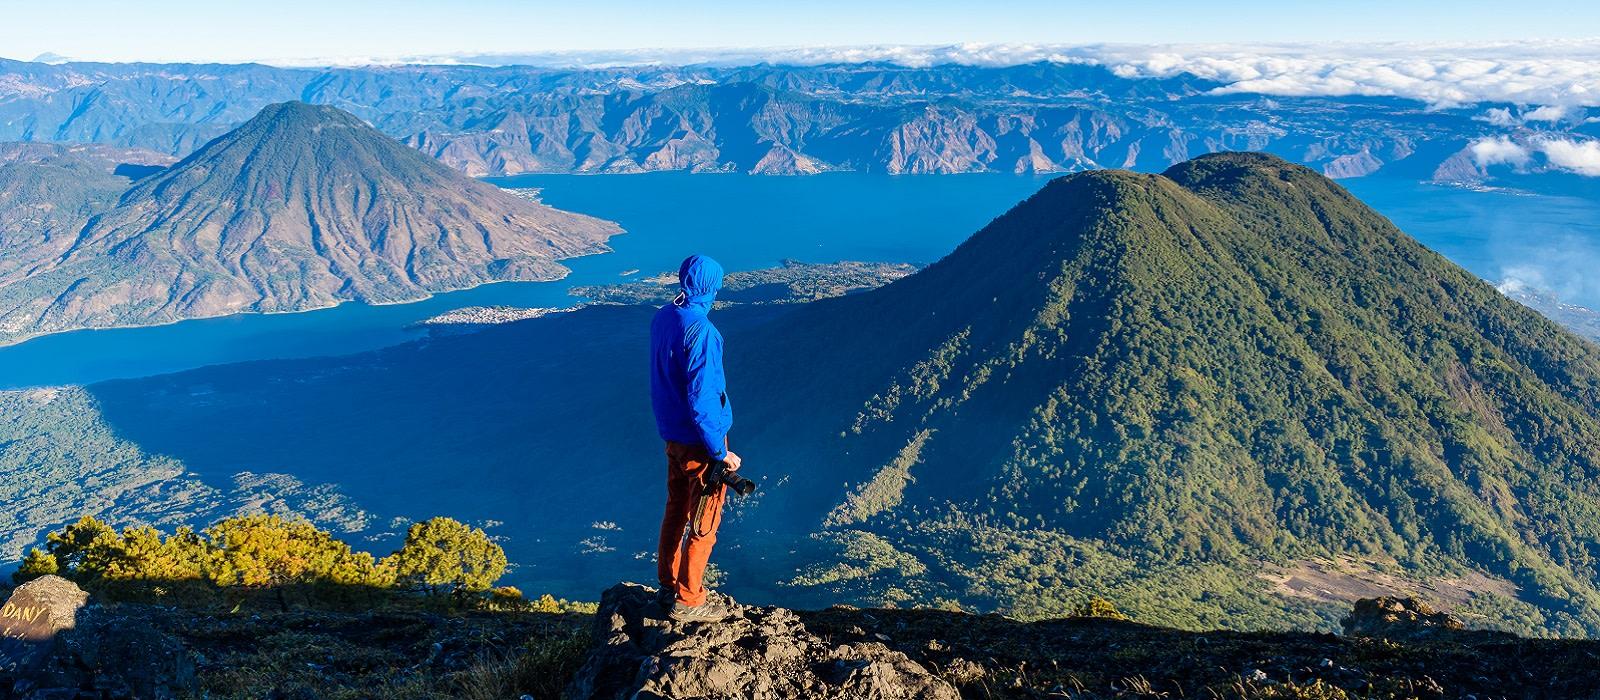 Reiseziel Atitlan-See Guatemala